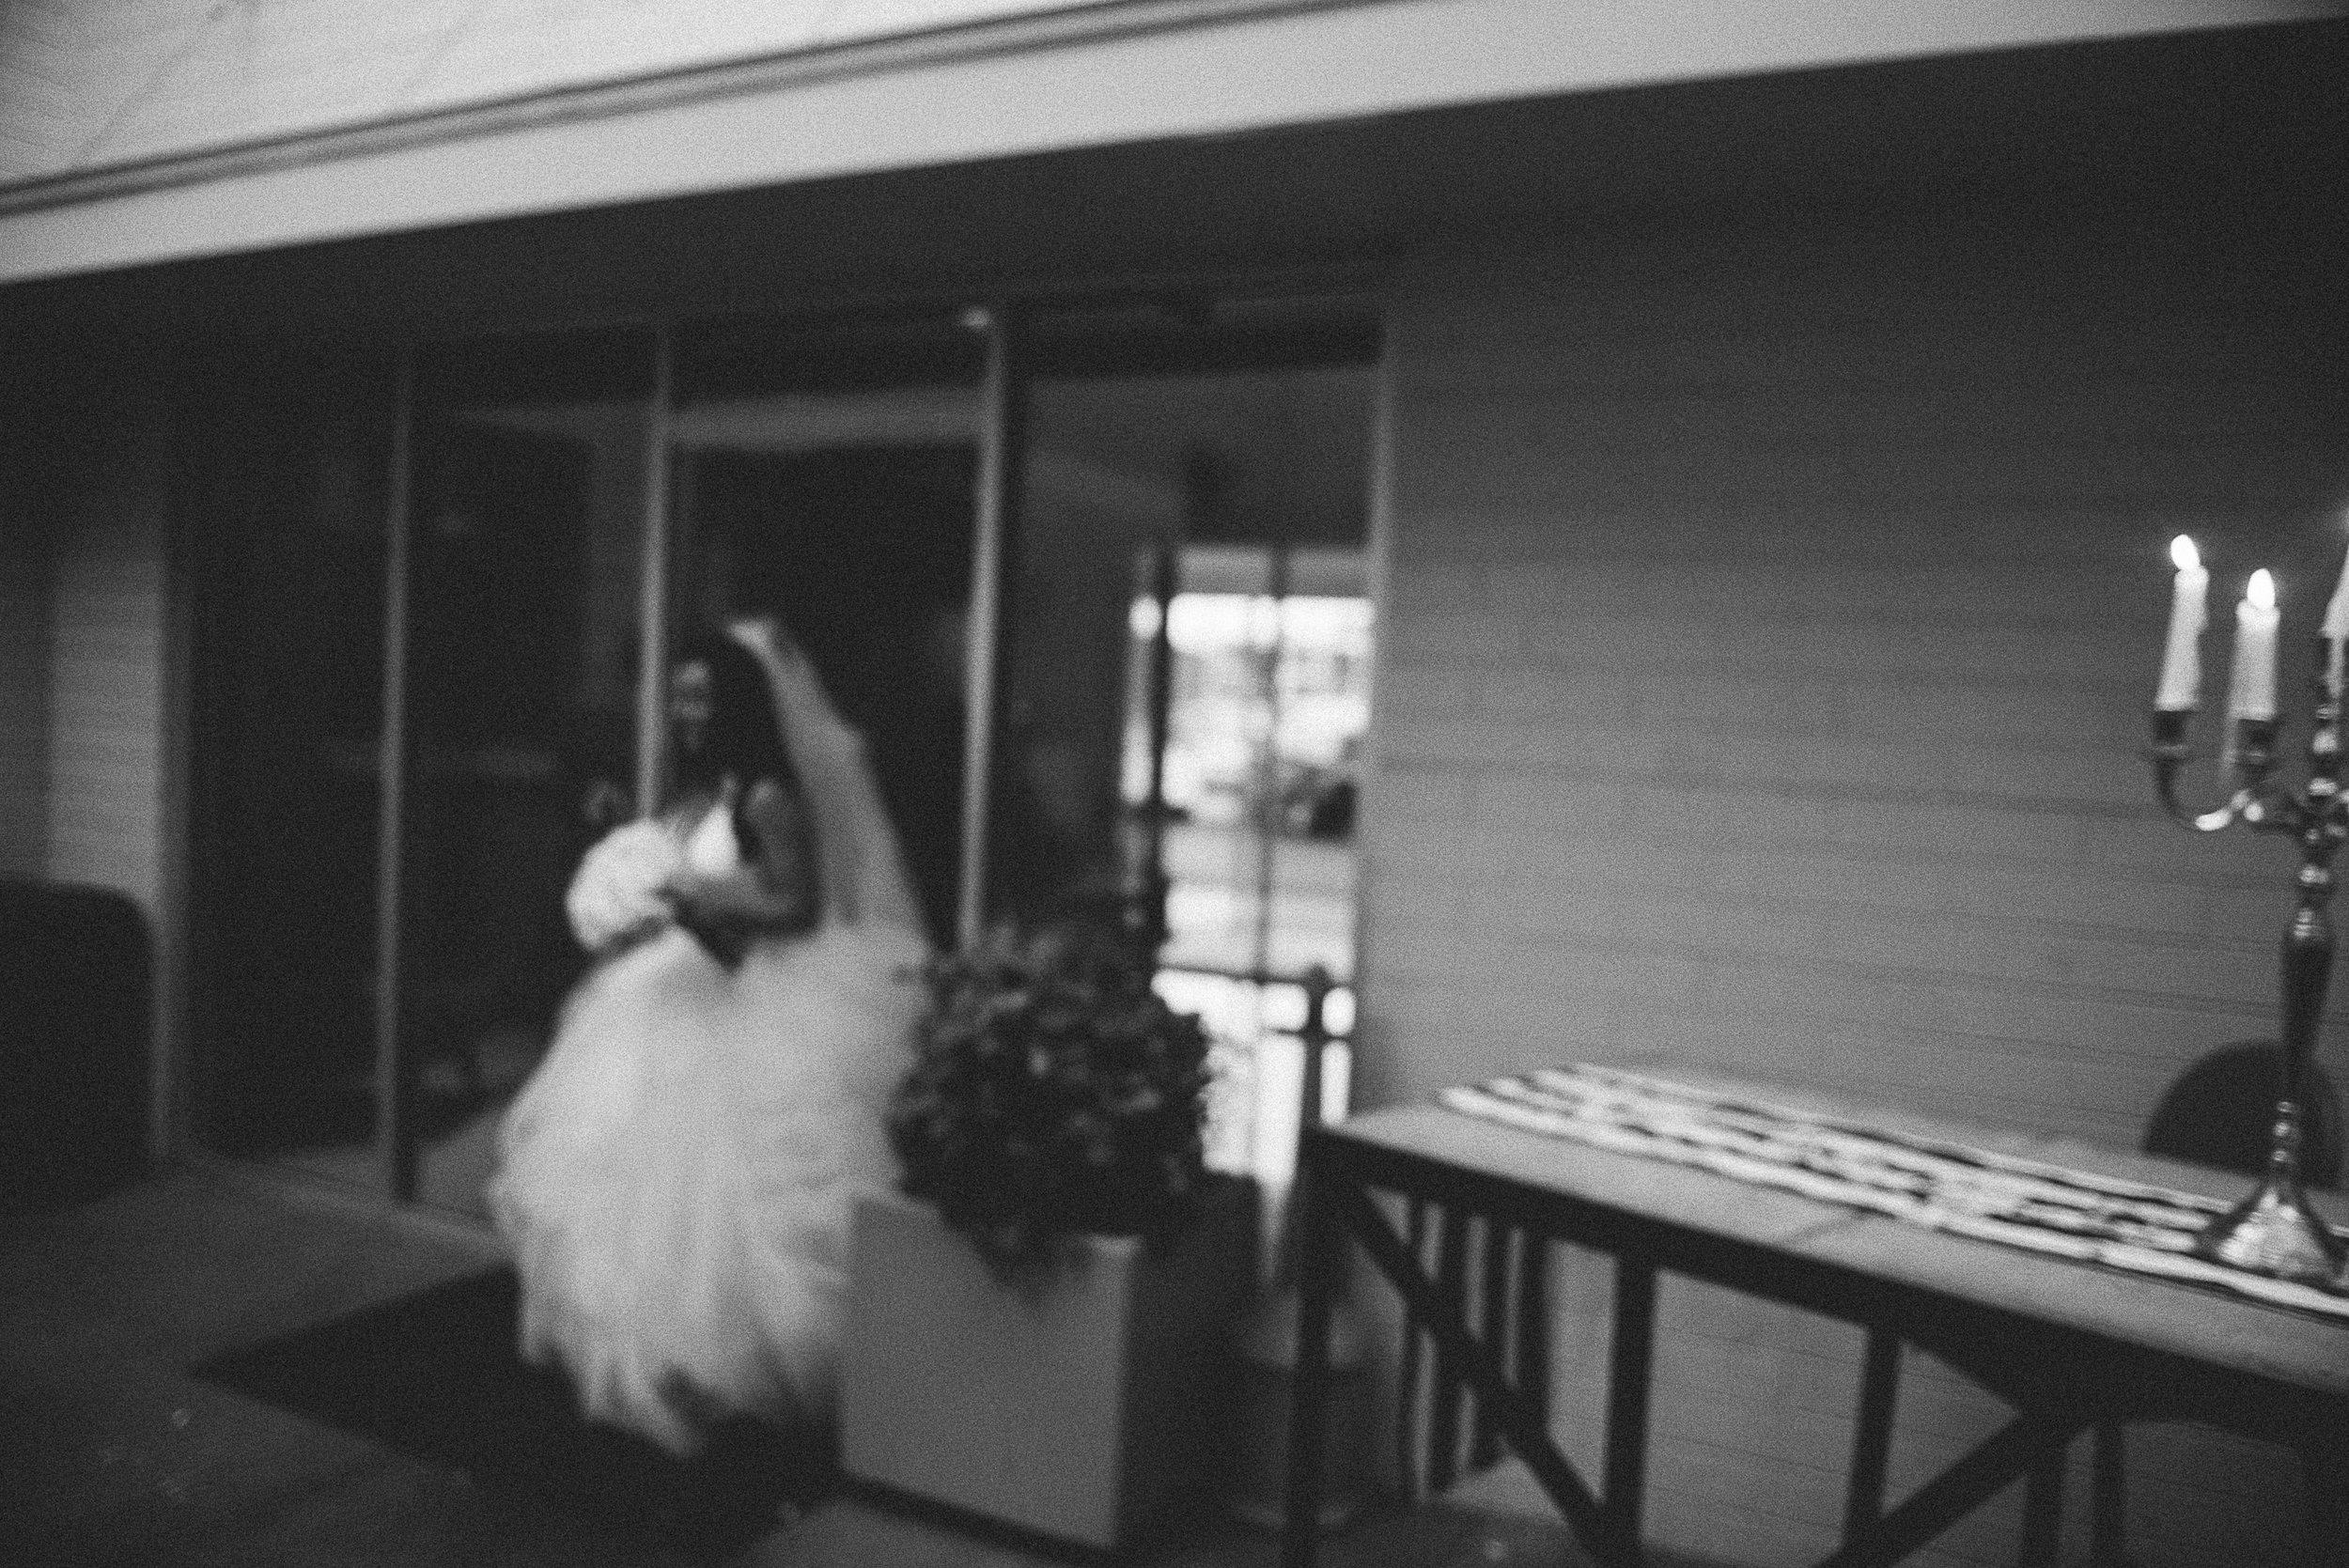 las vegas cosmopolitan wedding, las Vegas wedding, las vegas elopement, vegas wedding, vera wang wedding dress, handsome groom, beautiful bride, las vegas wedding photography, wedding inspiration, 1,000 roses, roses, simple wedding, classic wedding, vintage wedding, wedding photographer, ashley marie myers